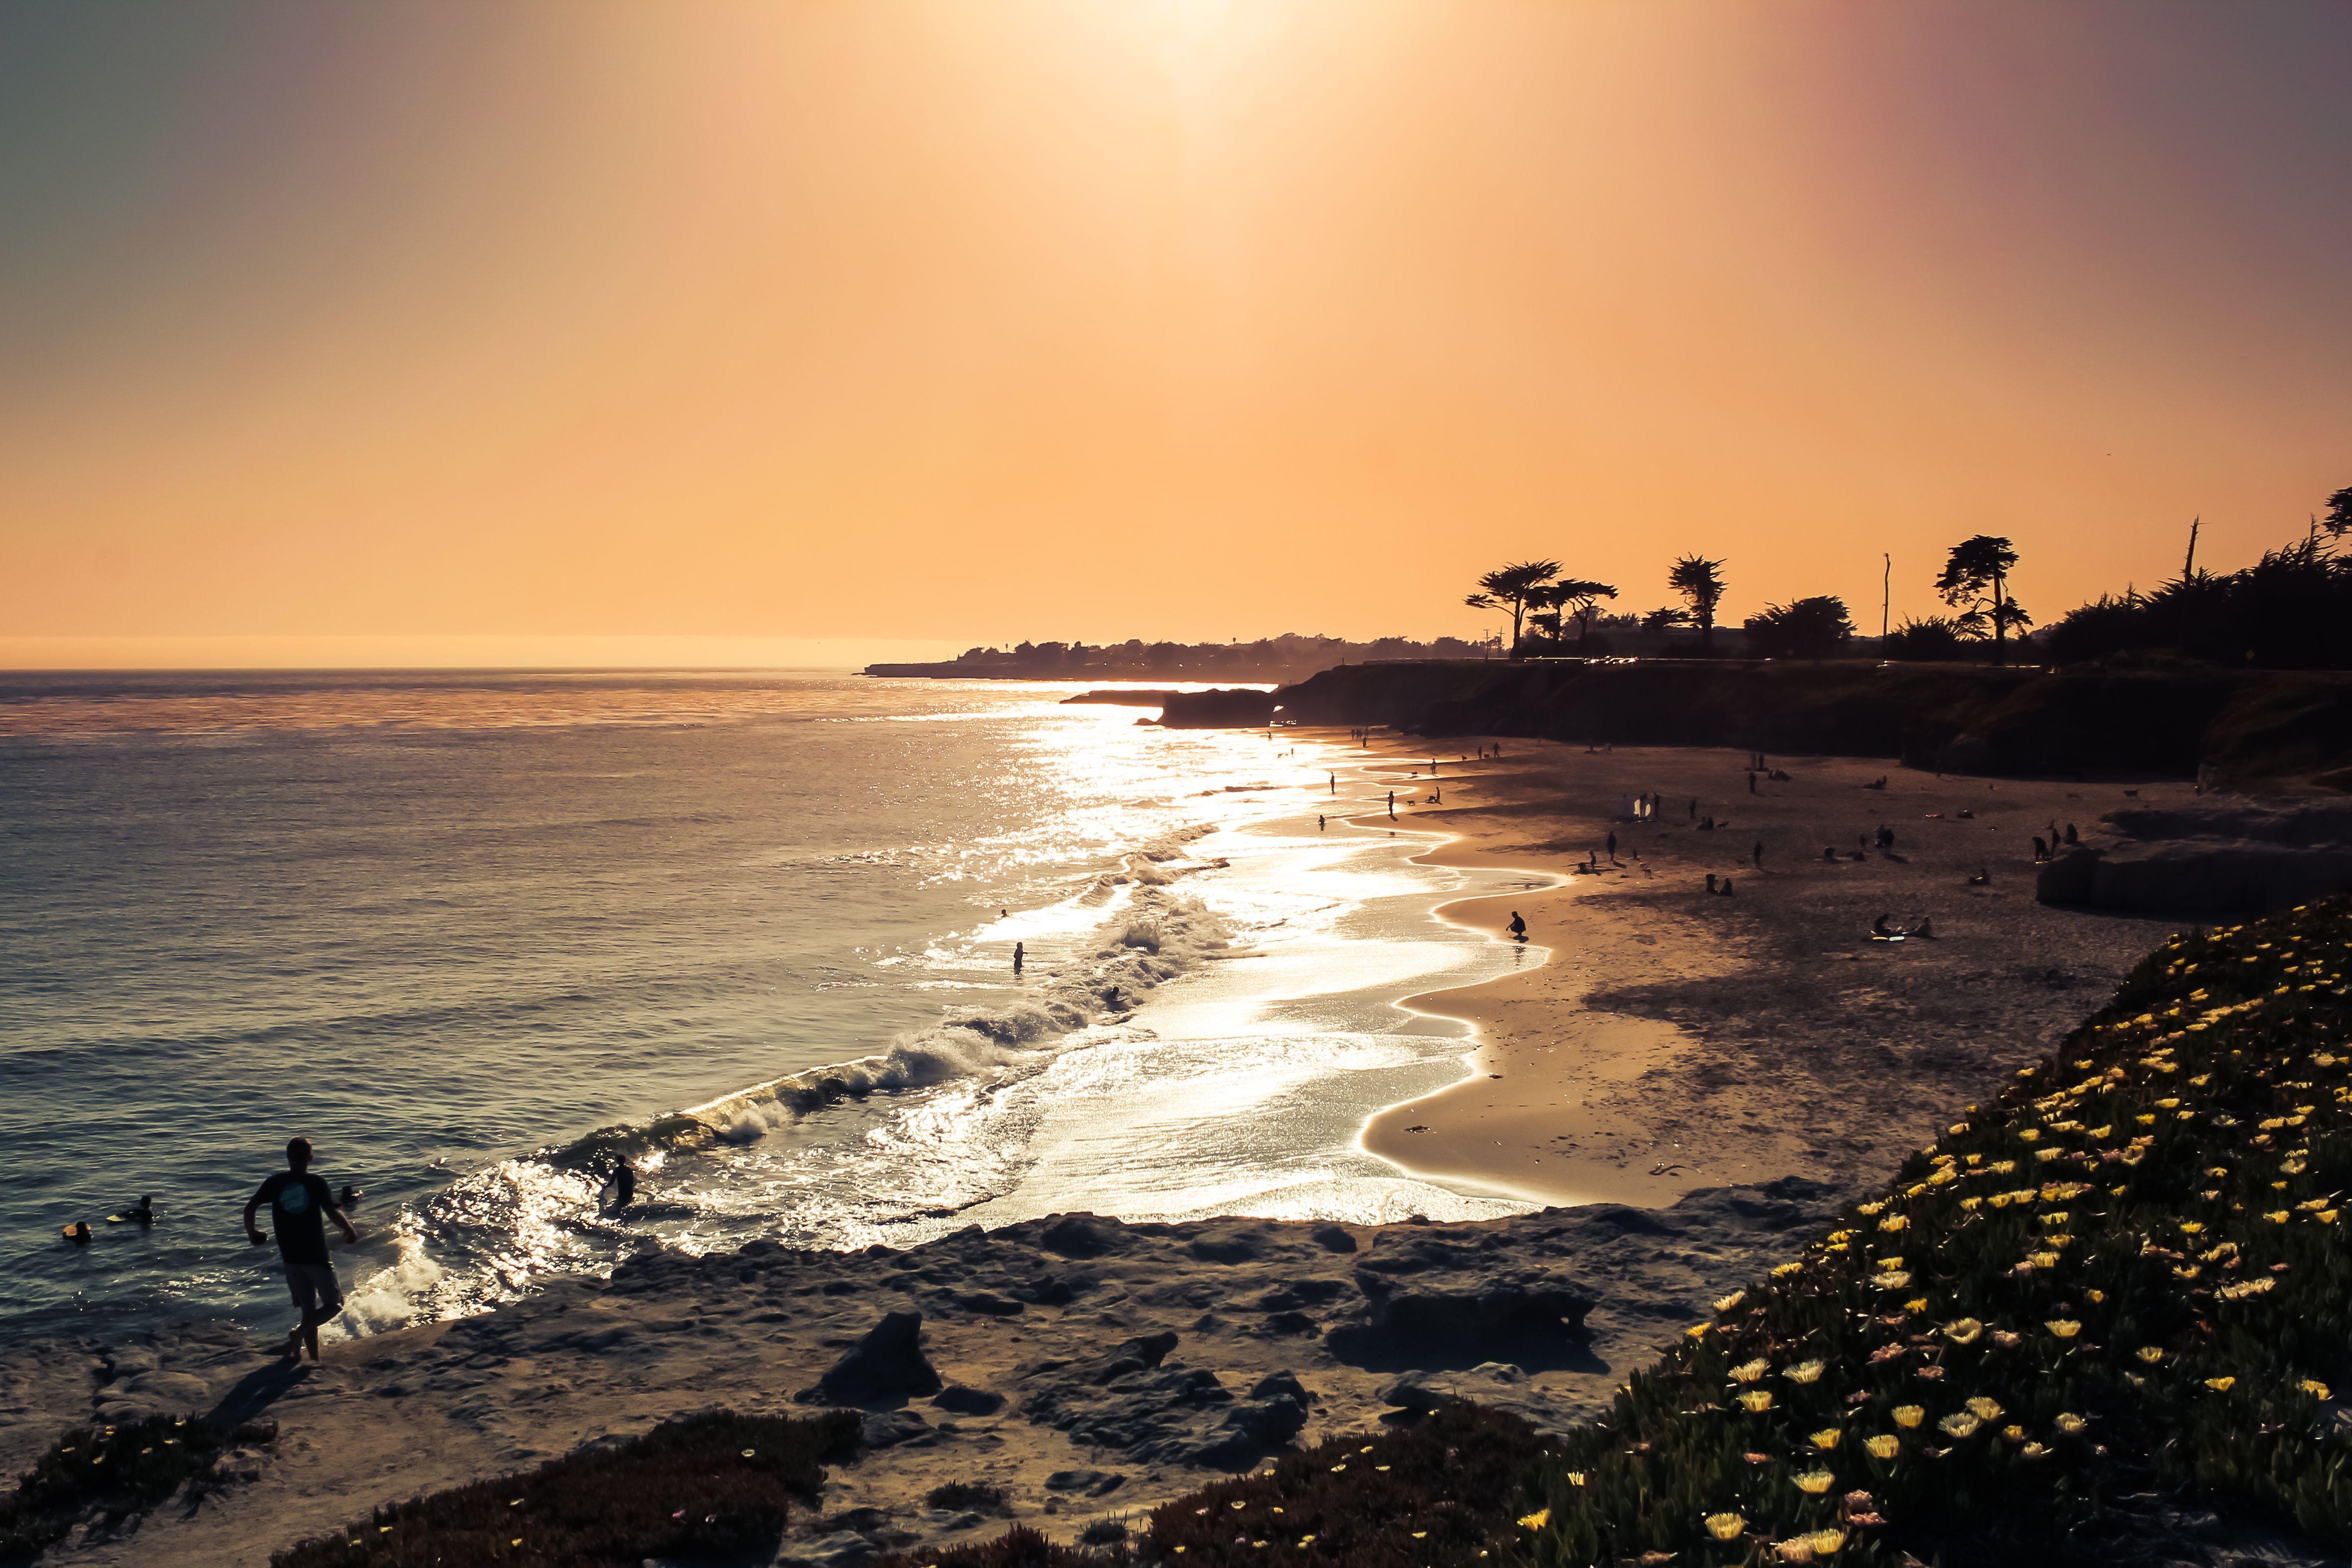 Hd Wallpaper Santa Cruz Lighthouse Field State Beach Santa Cruz Lighthouse Santa Cruz Nature Photos